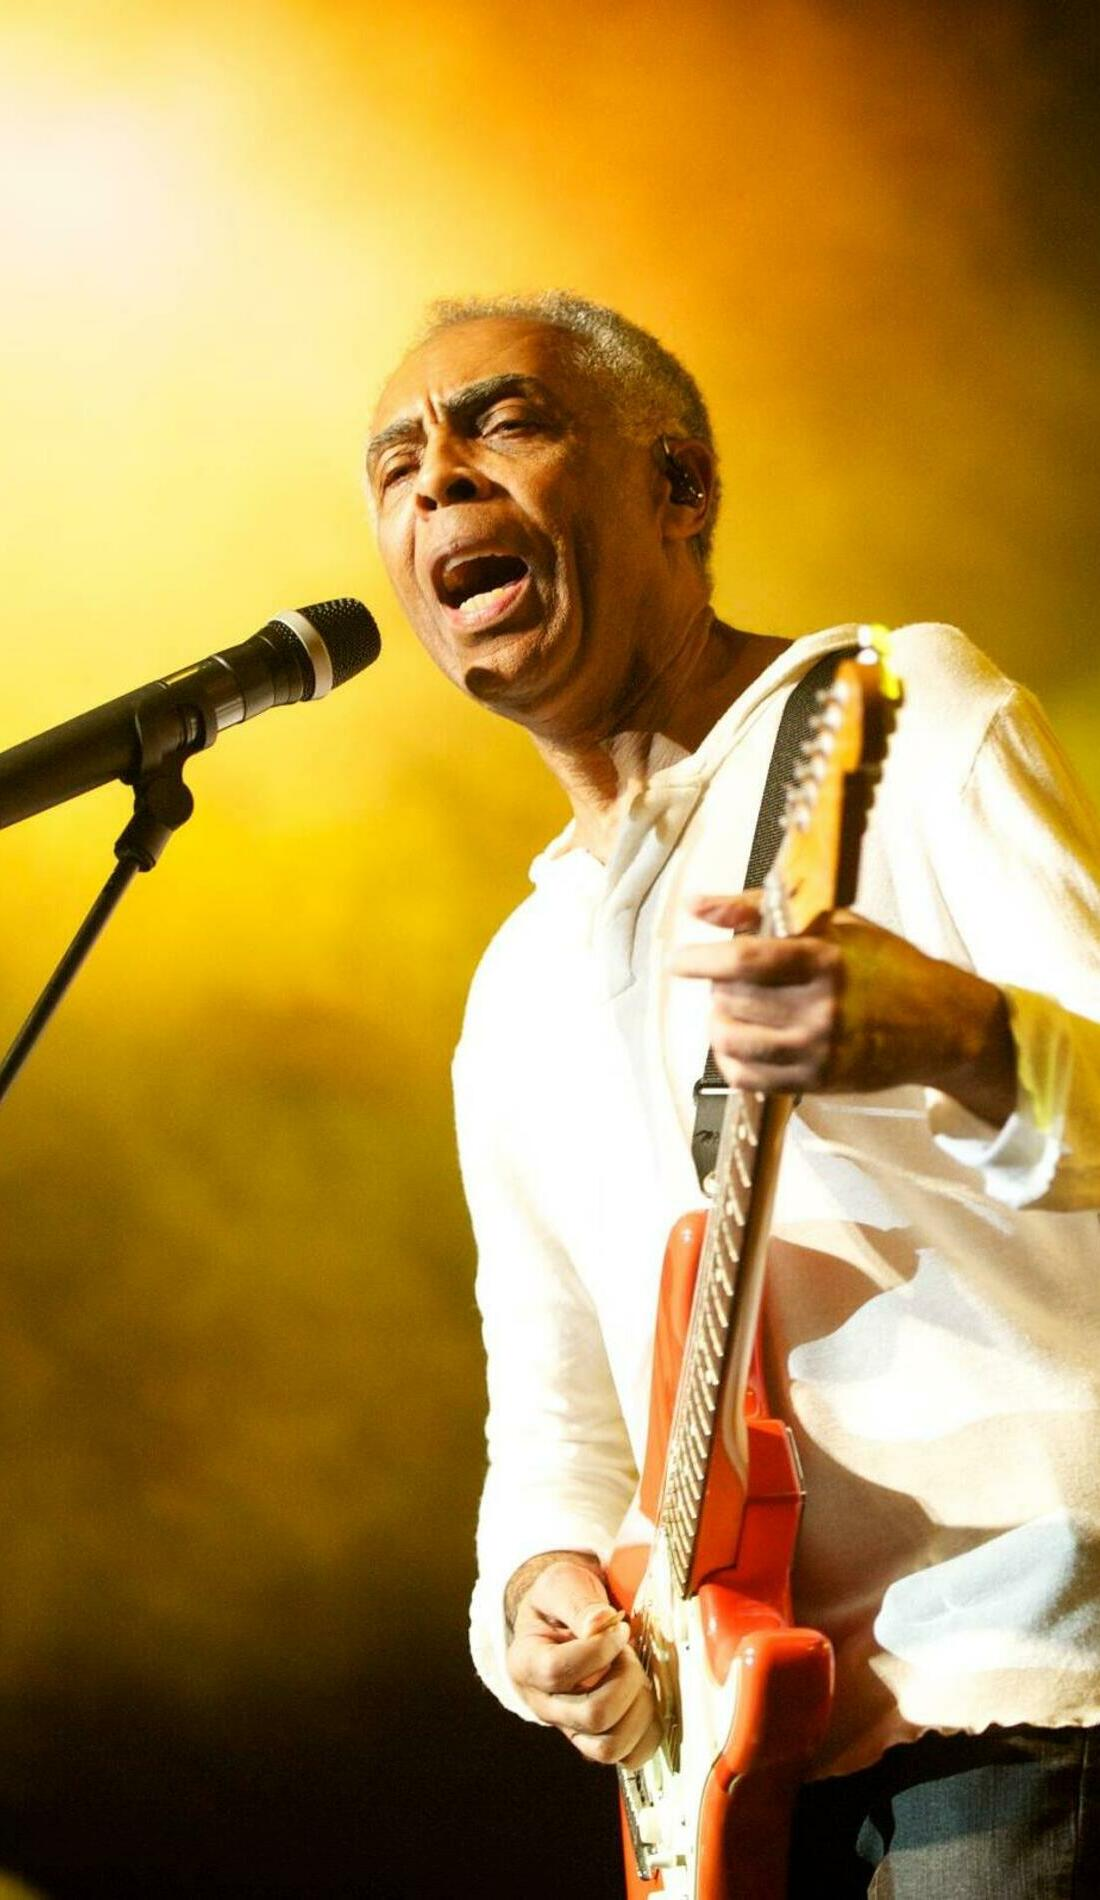 A Gilberto Gil live event